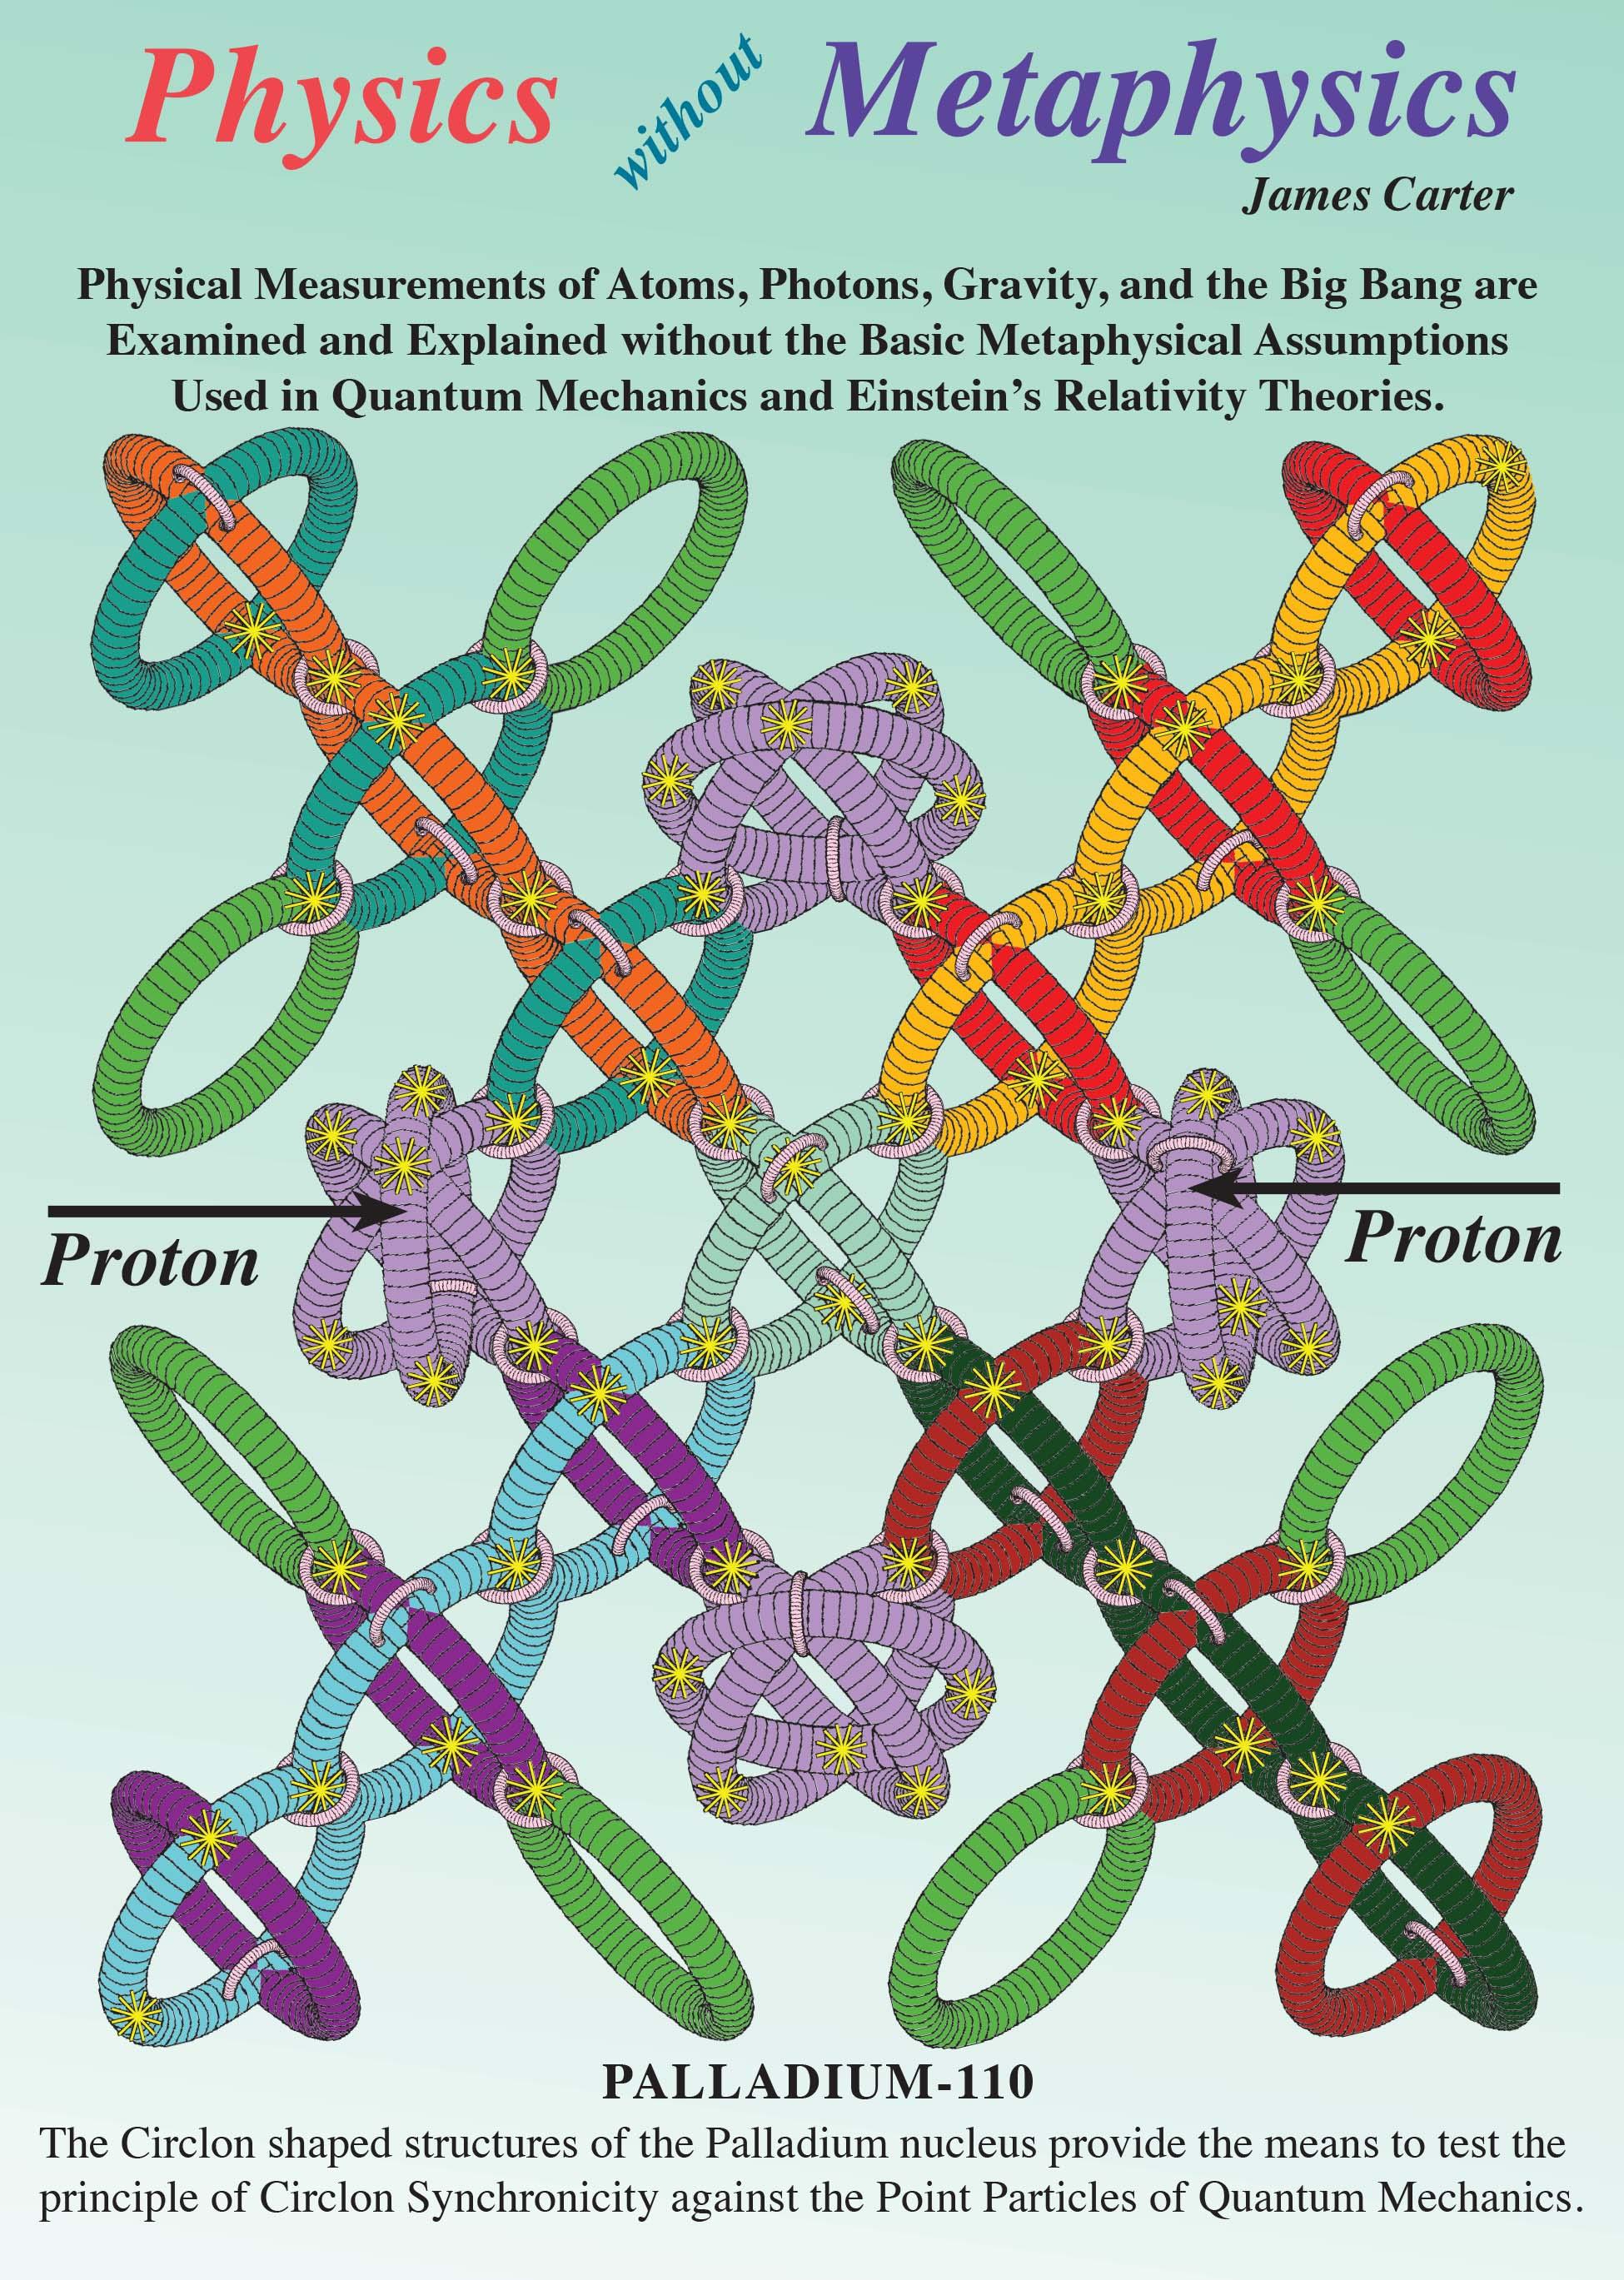 Physics without Metaphysics living-universe